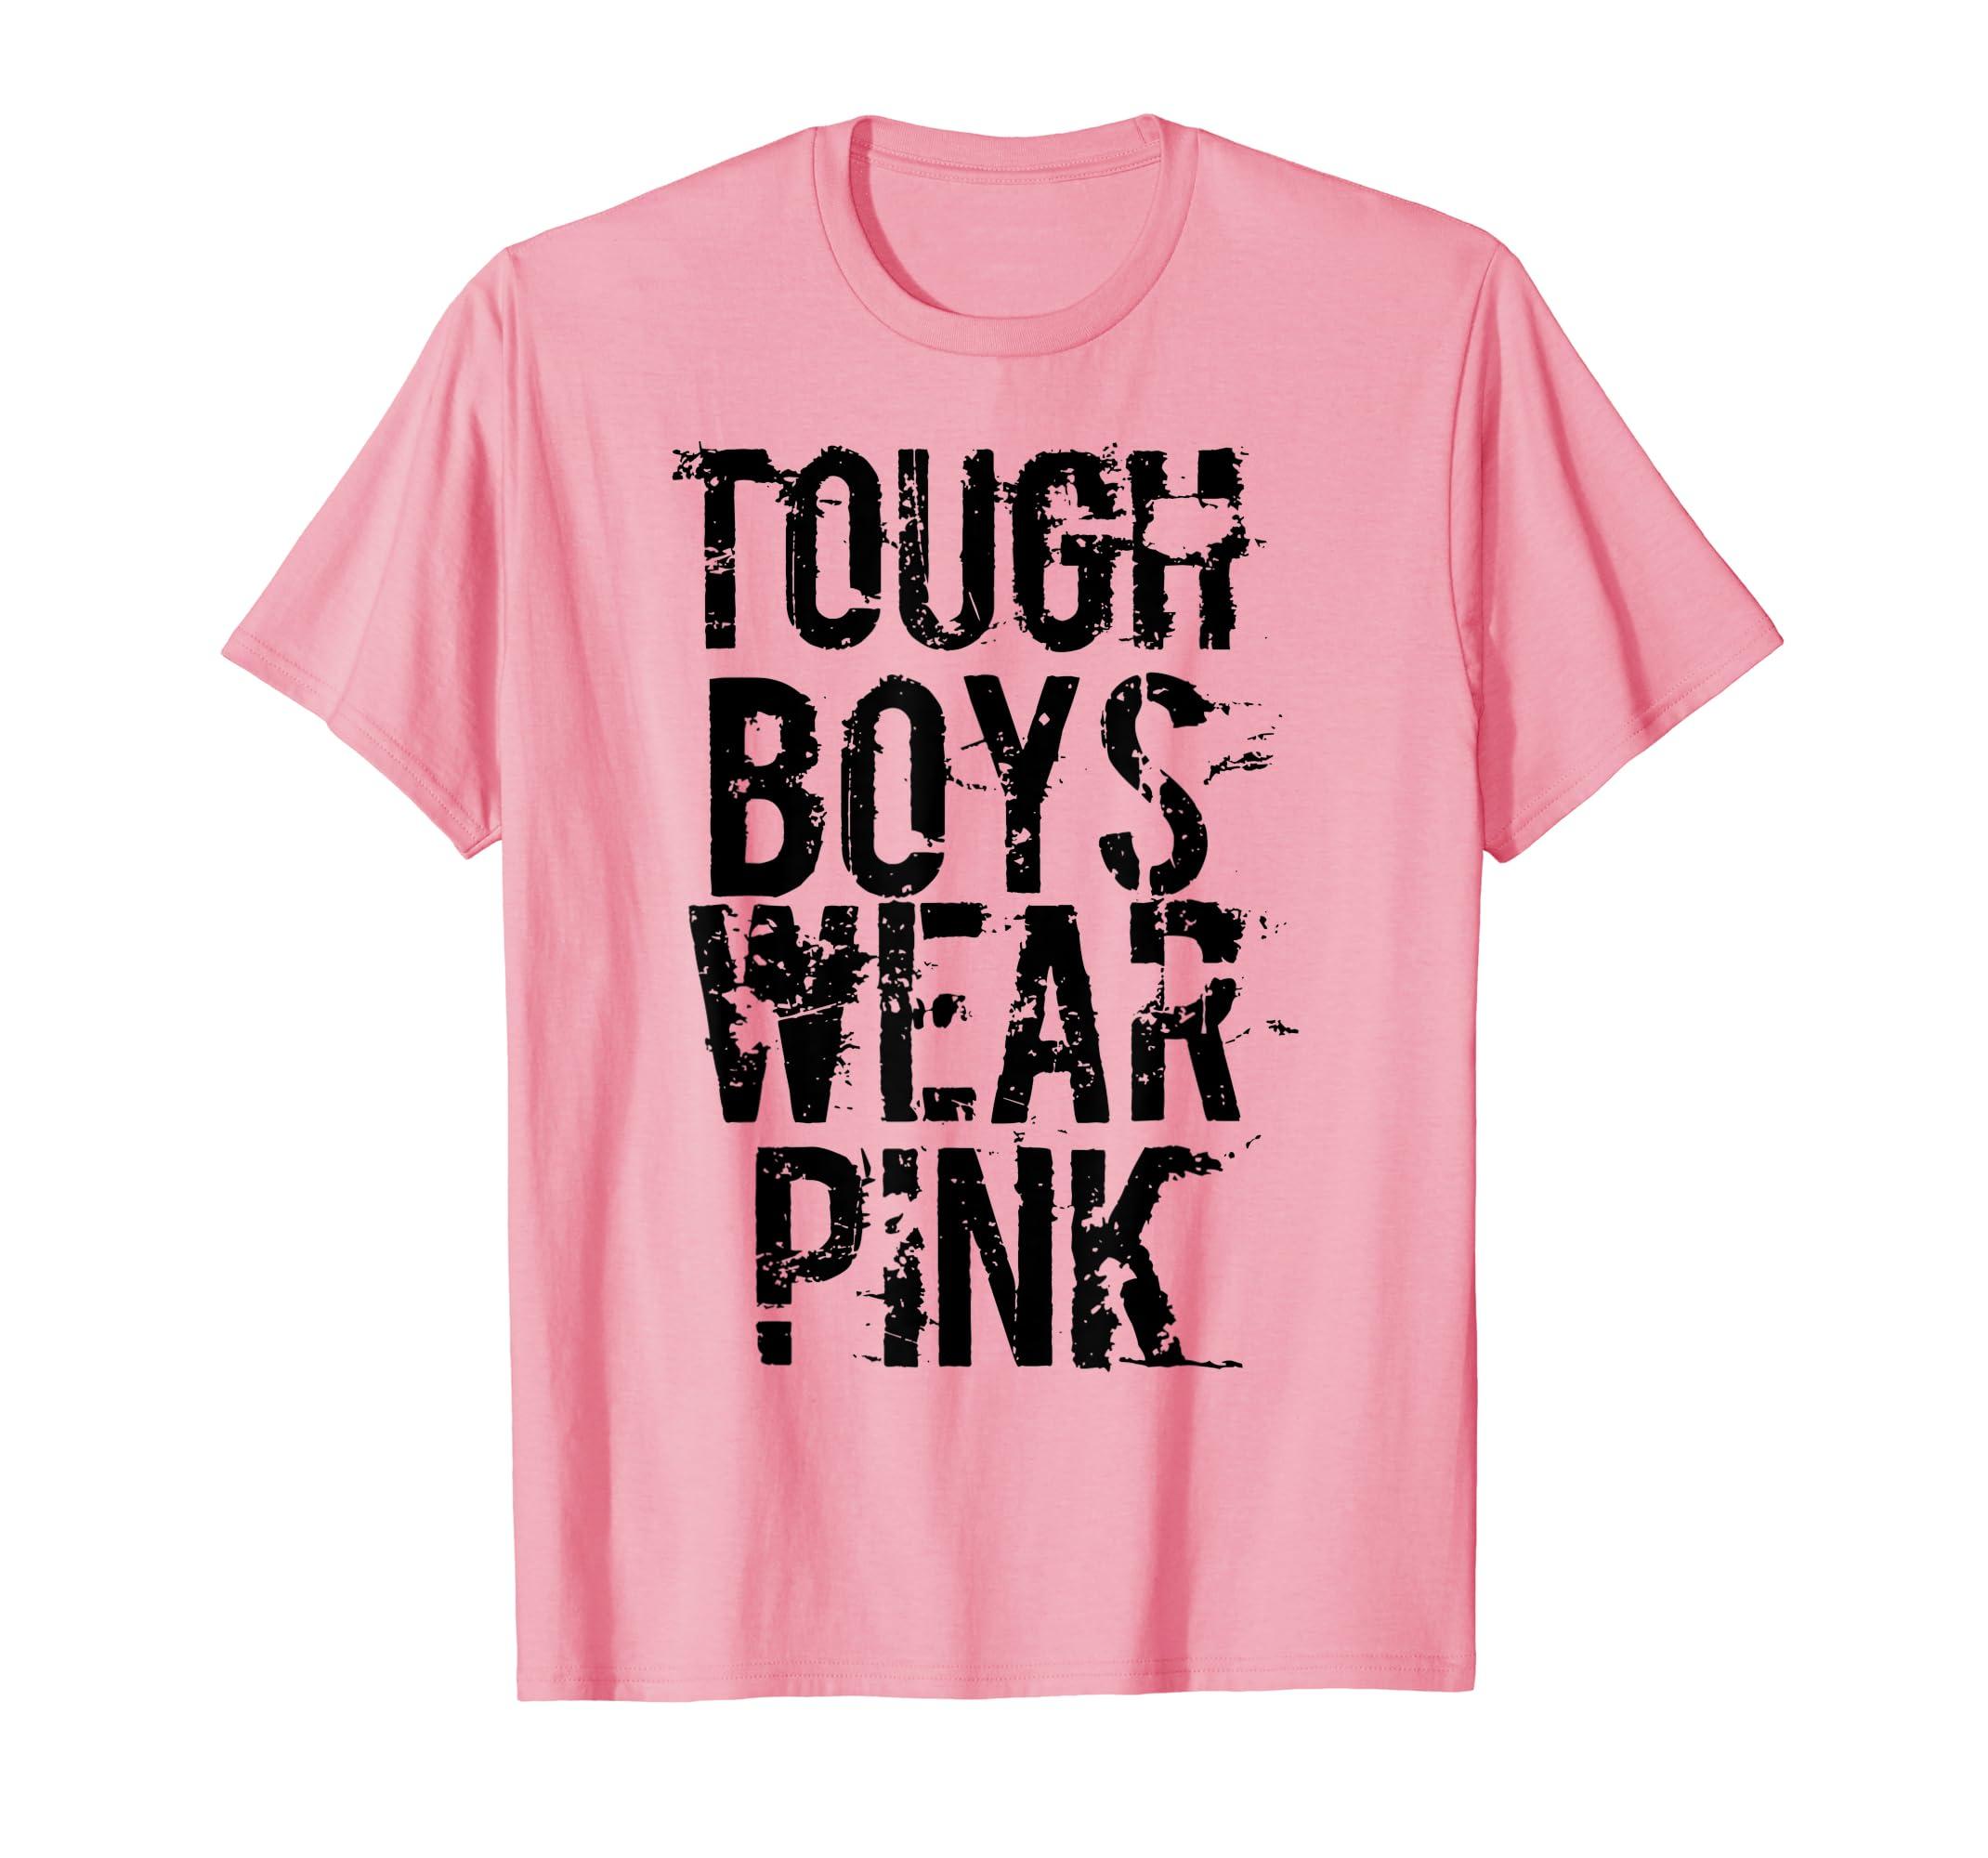 aff33983 Amazon.com: Tough Boys Wear Pink Cool Pink T Shirt: Clothing